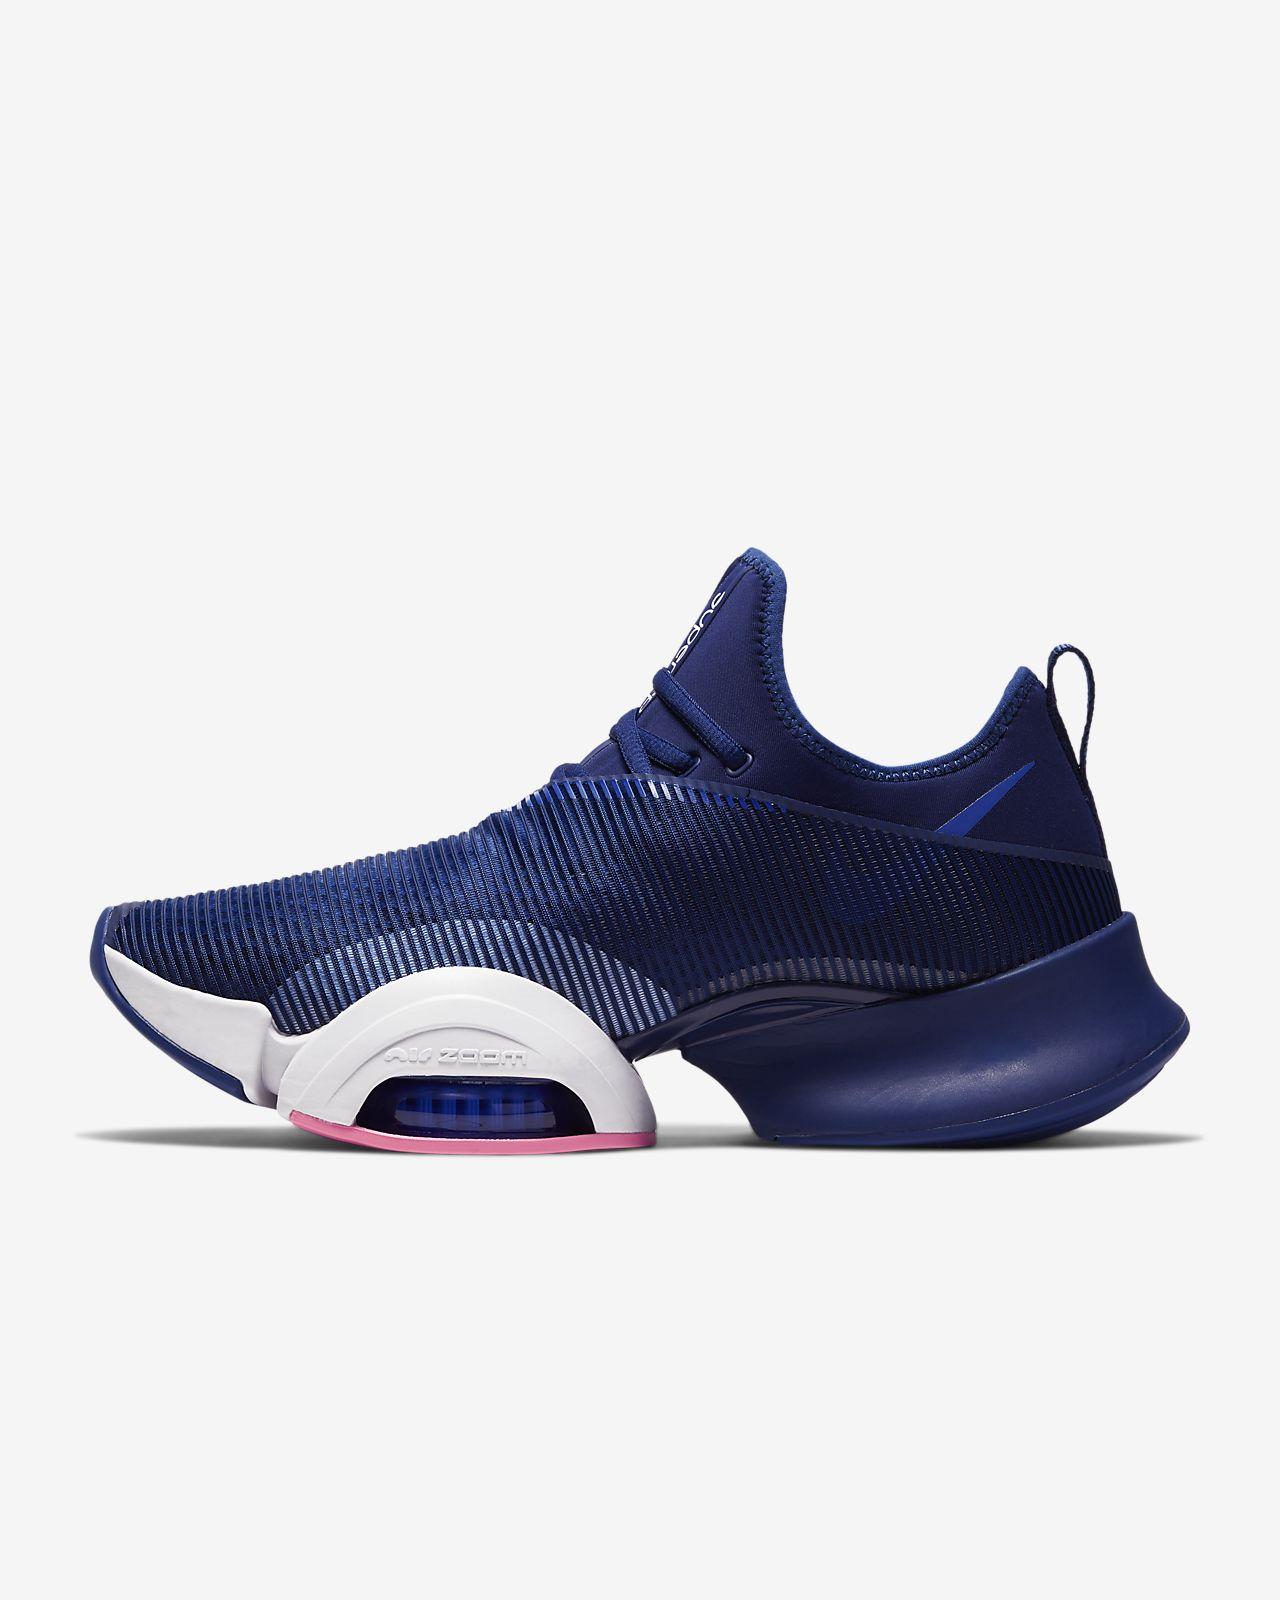 Nike Air Zoom SuperRep HIIT Schuhe für Herren